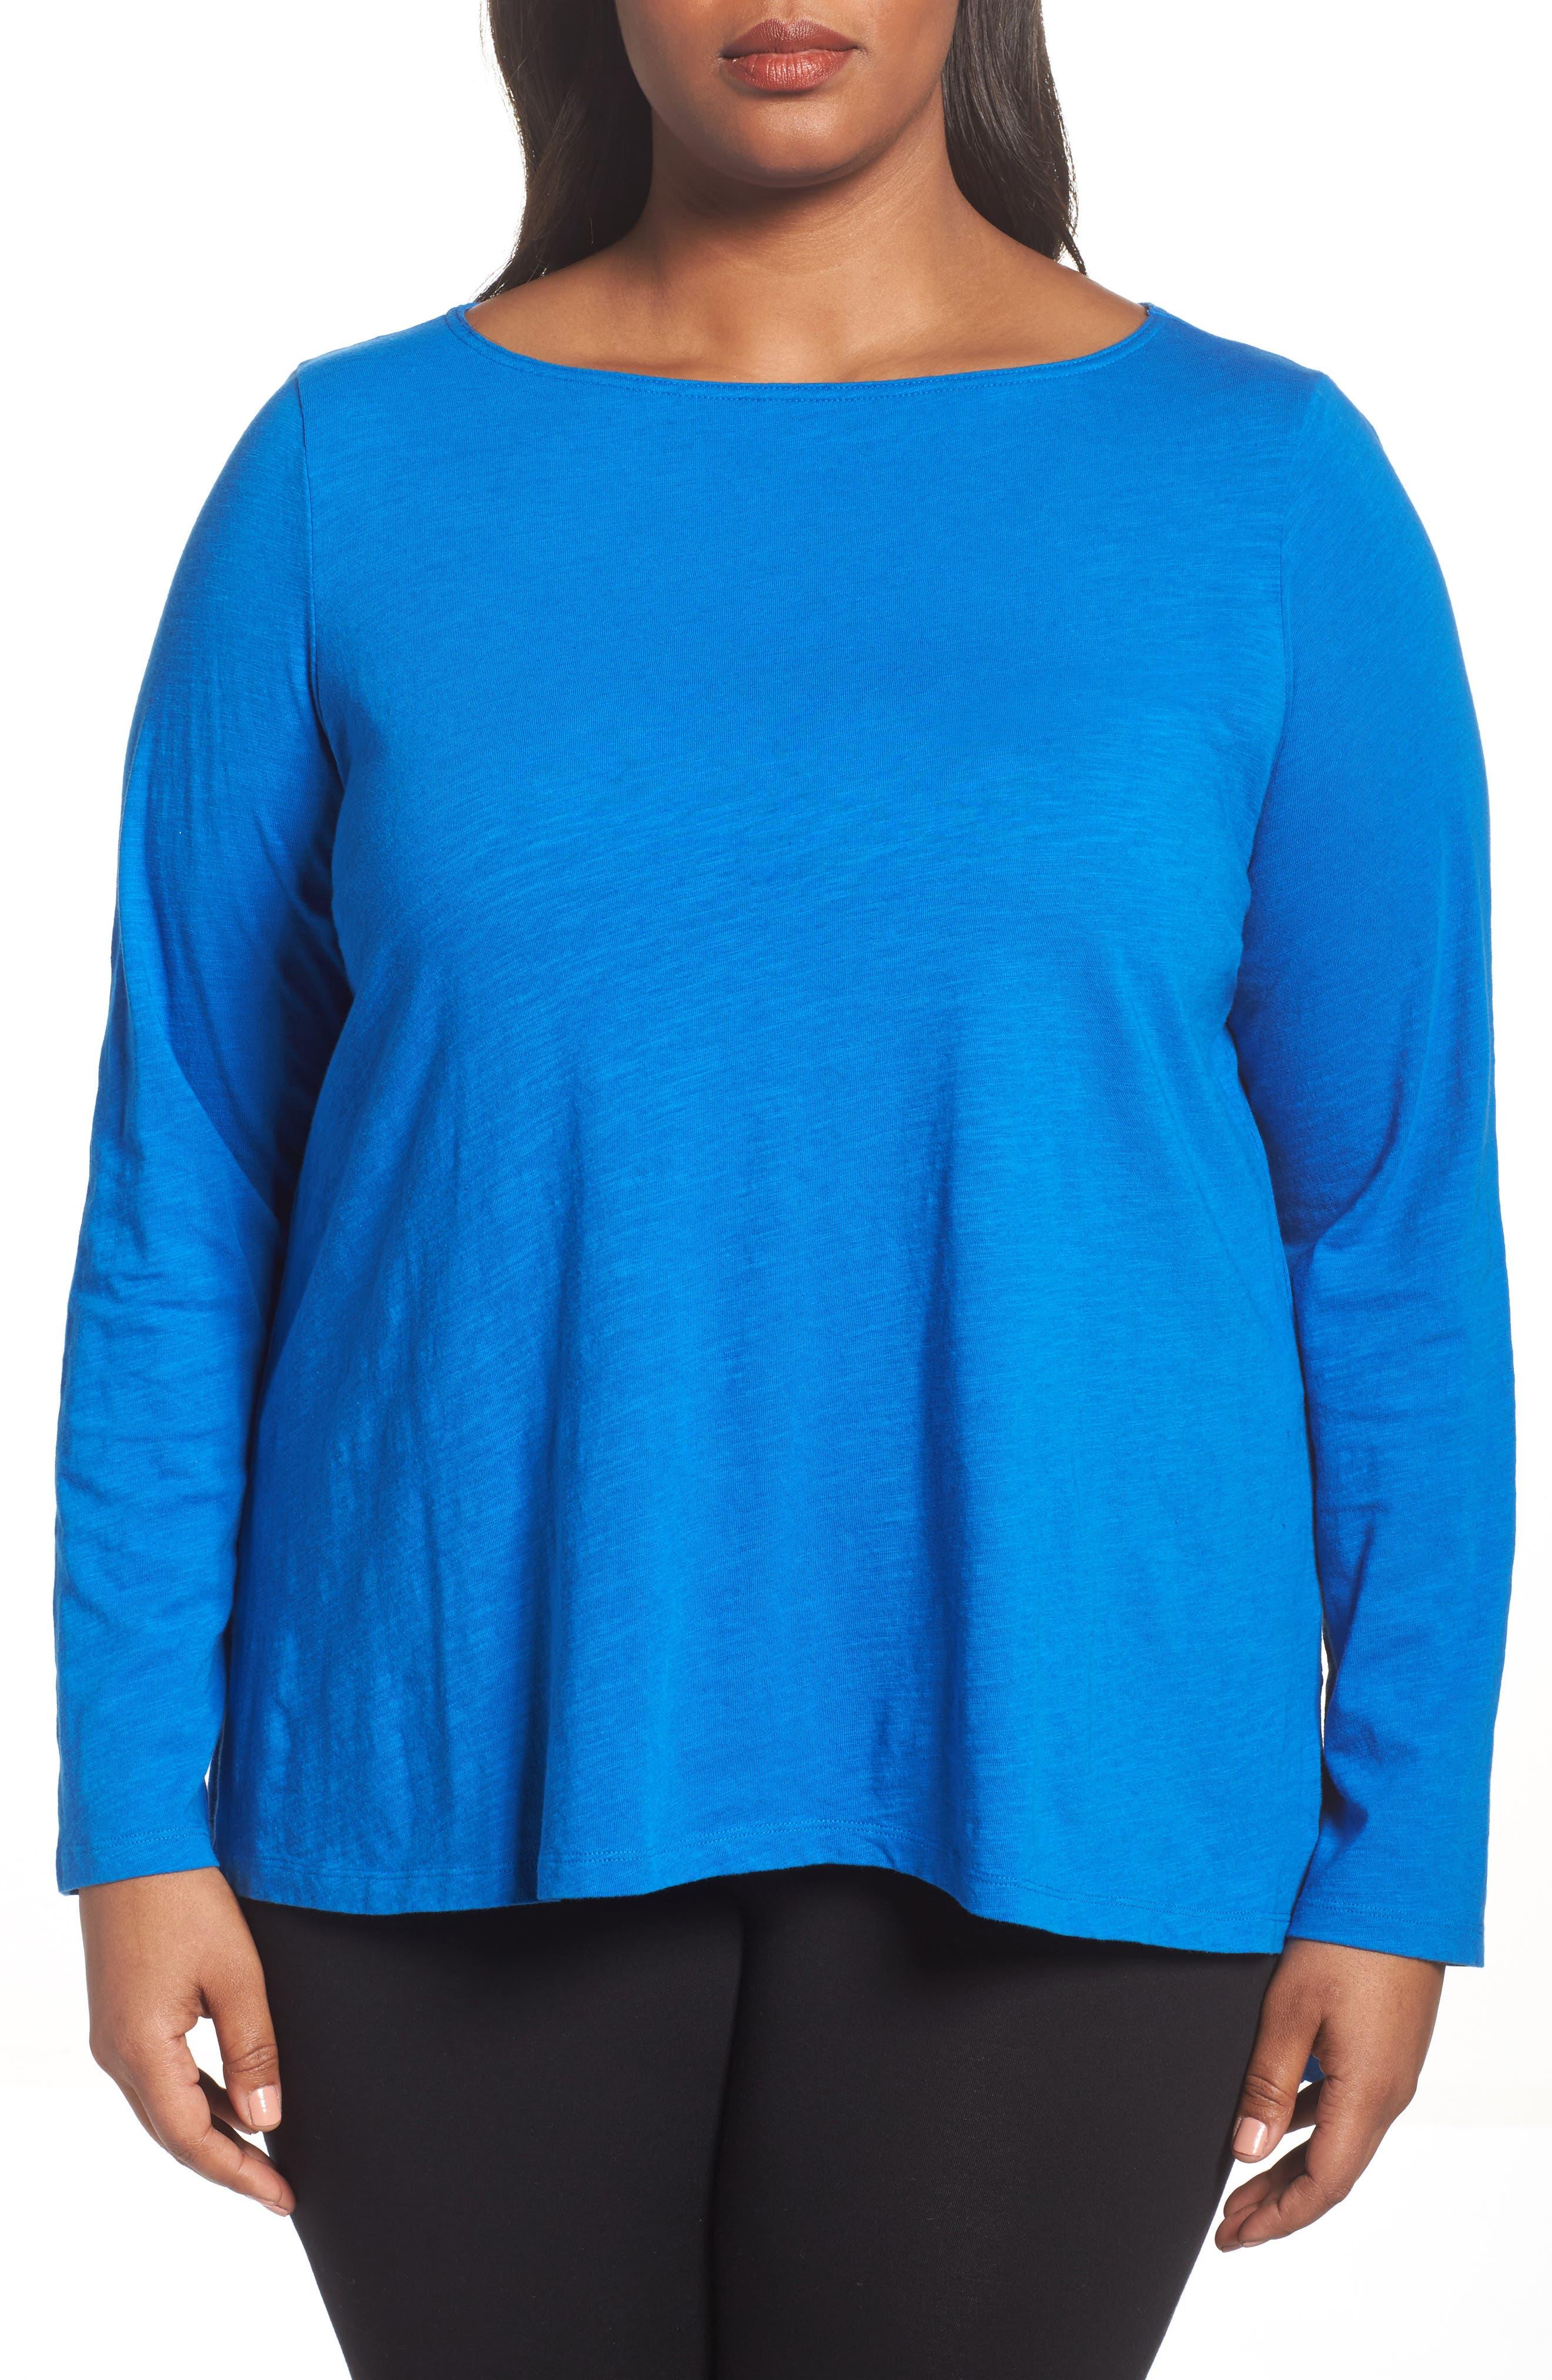 Organic Cotton Jersey Top,                             Alternate thumbnail 4, color,                             Blue